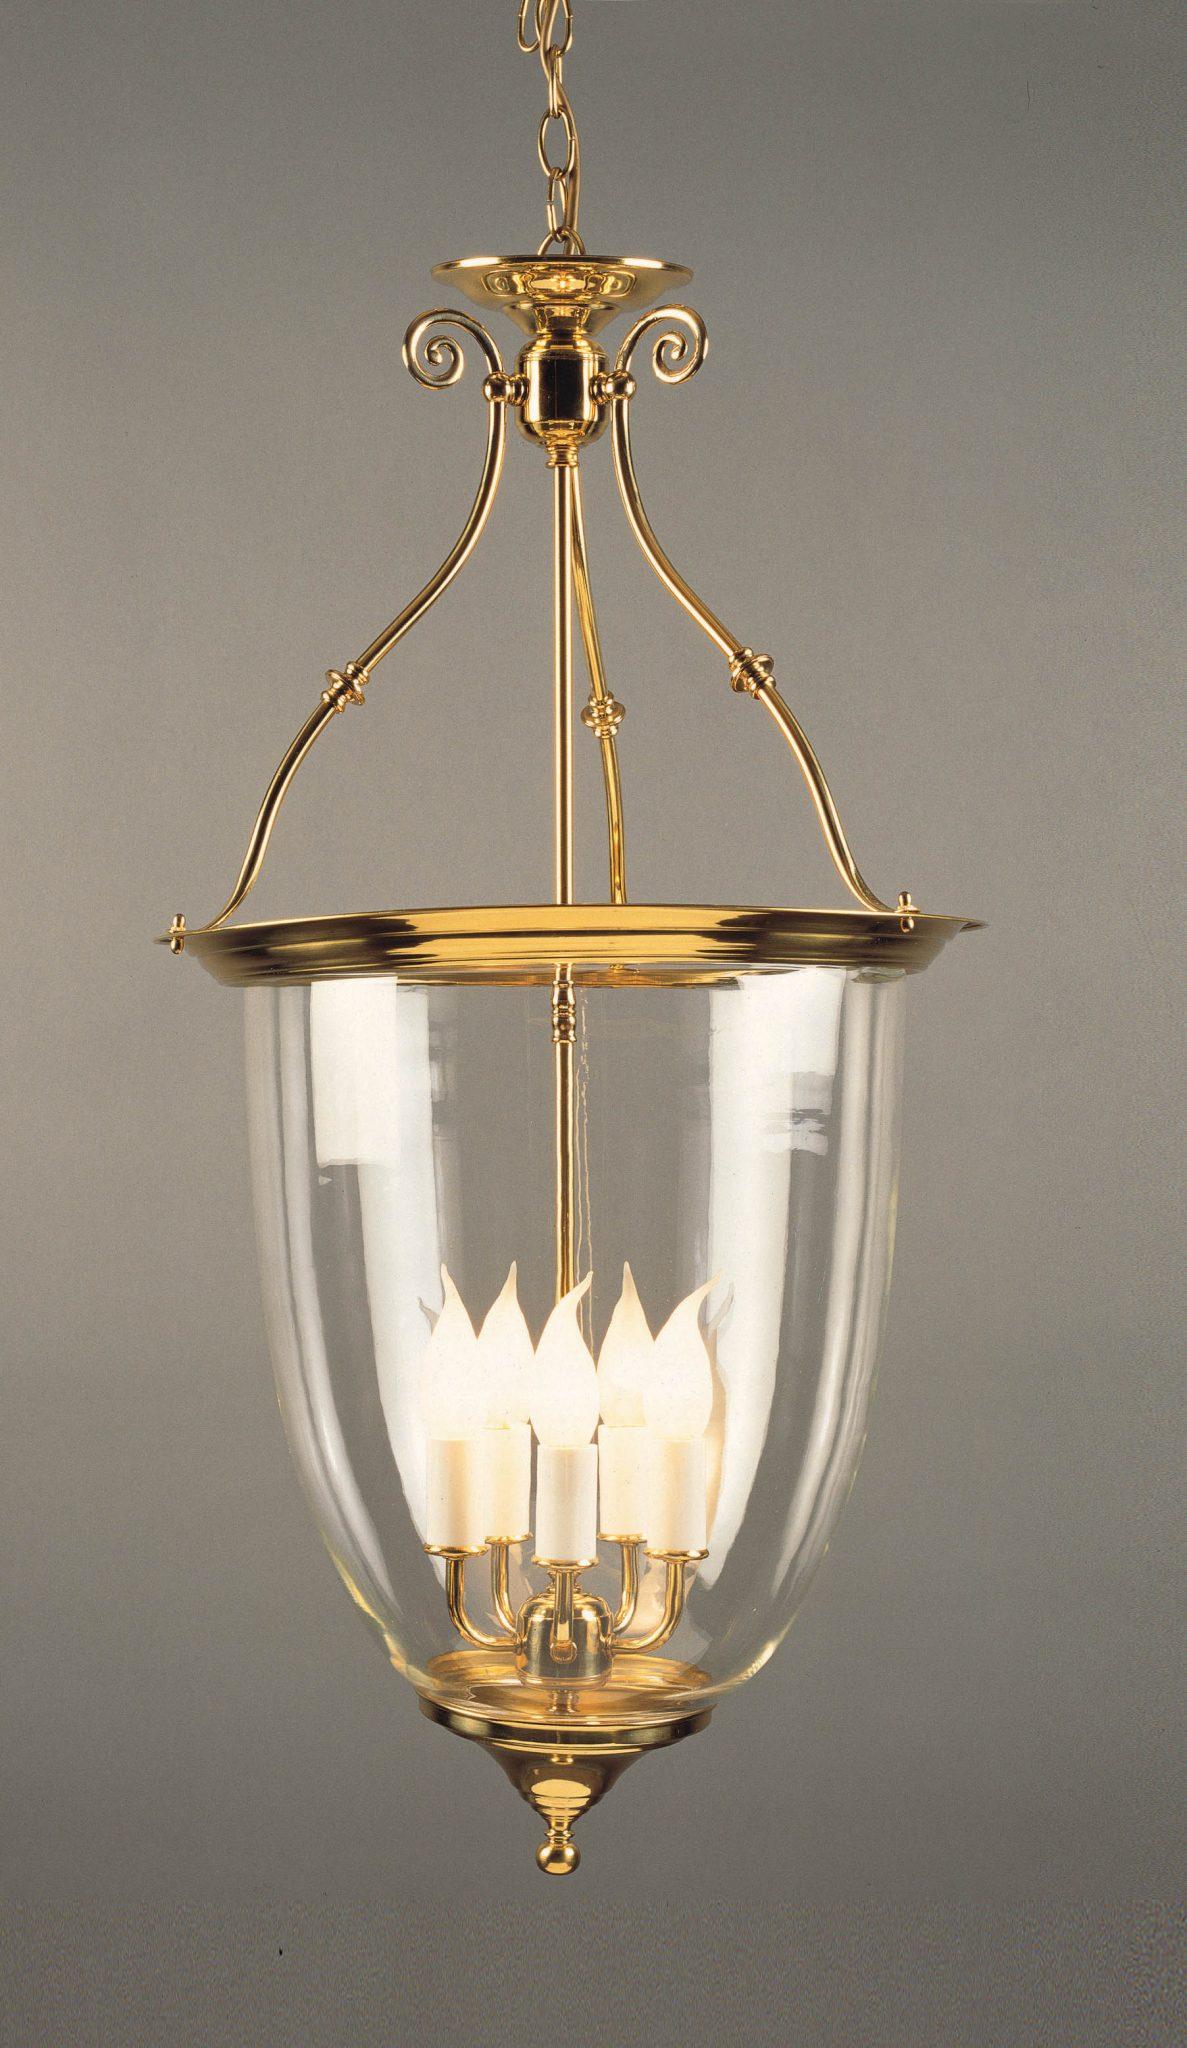 Impex LG01765/AM VigoLantern 5 light Lantern, Polished Brass